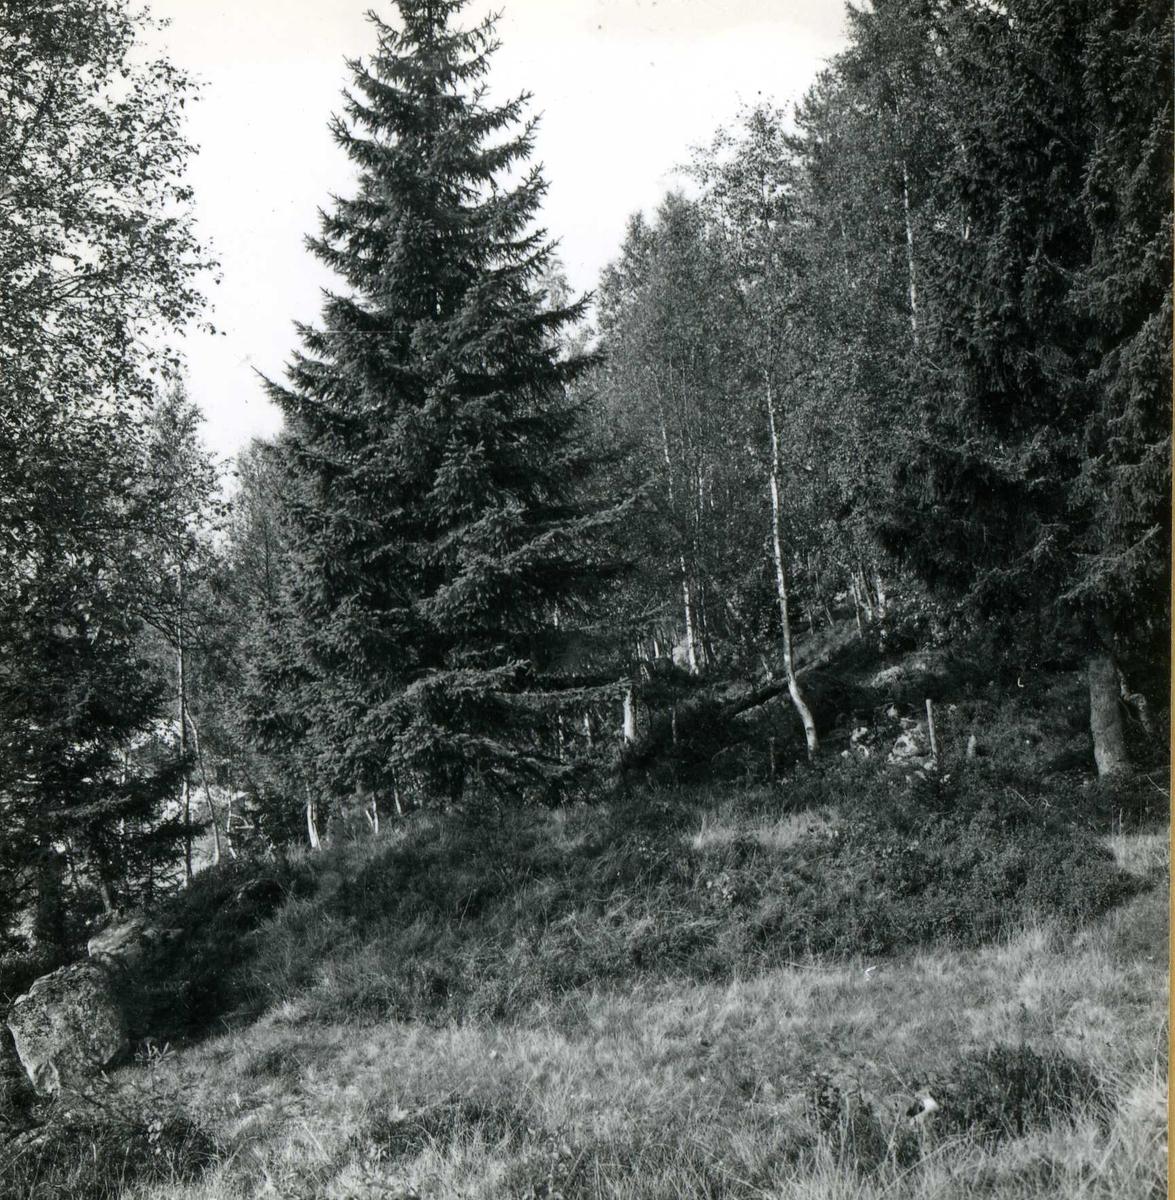 Tilløpstunnel frå Vesås. Skogsområde